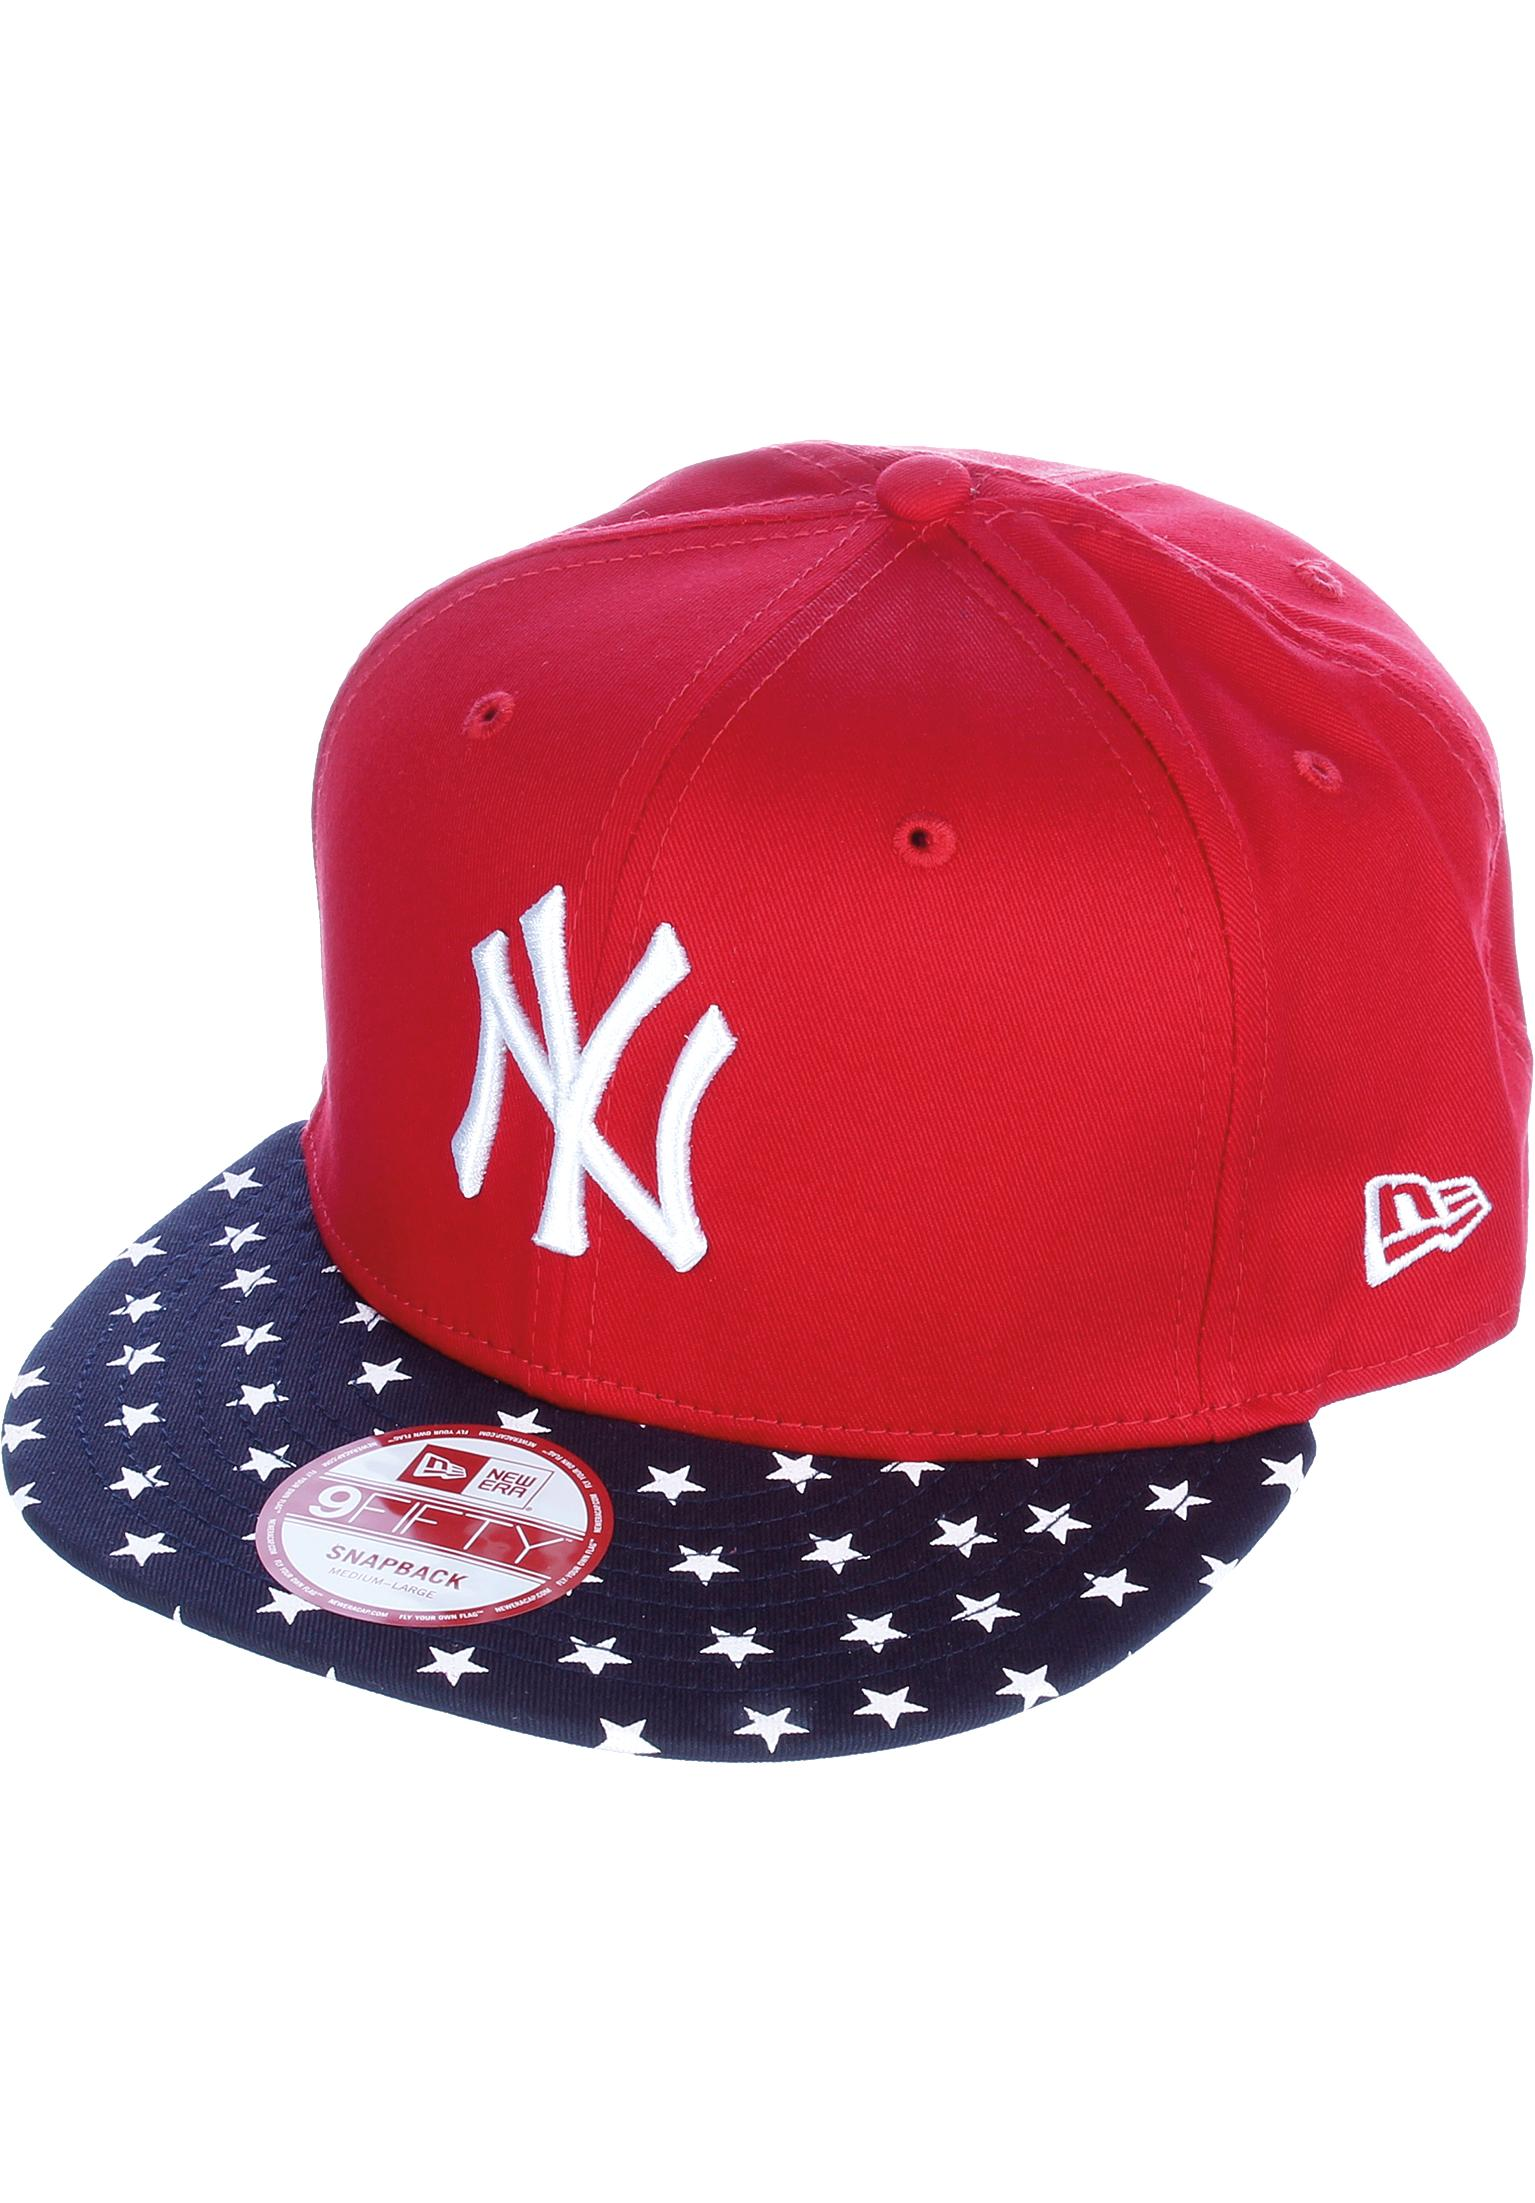 9Fifty Stars   Stripes New York Yankees New Era Caps in red-navy-white for  Men  3e42d5debcb